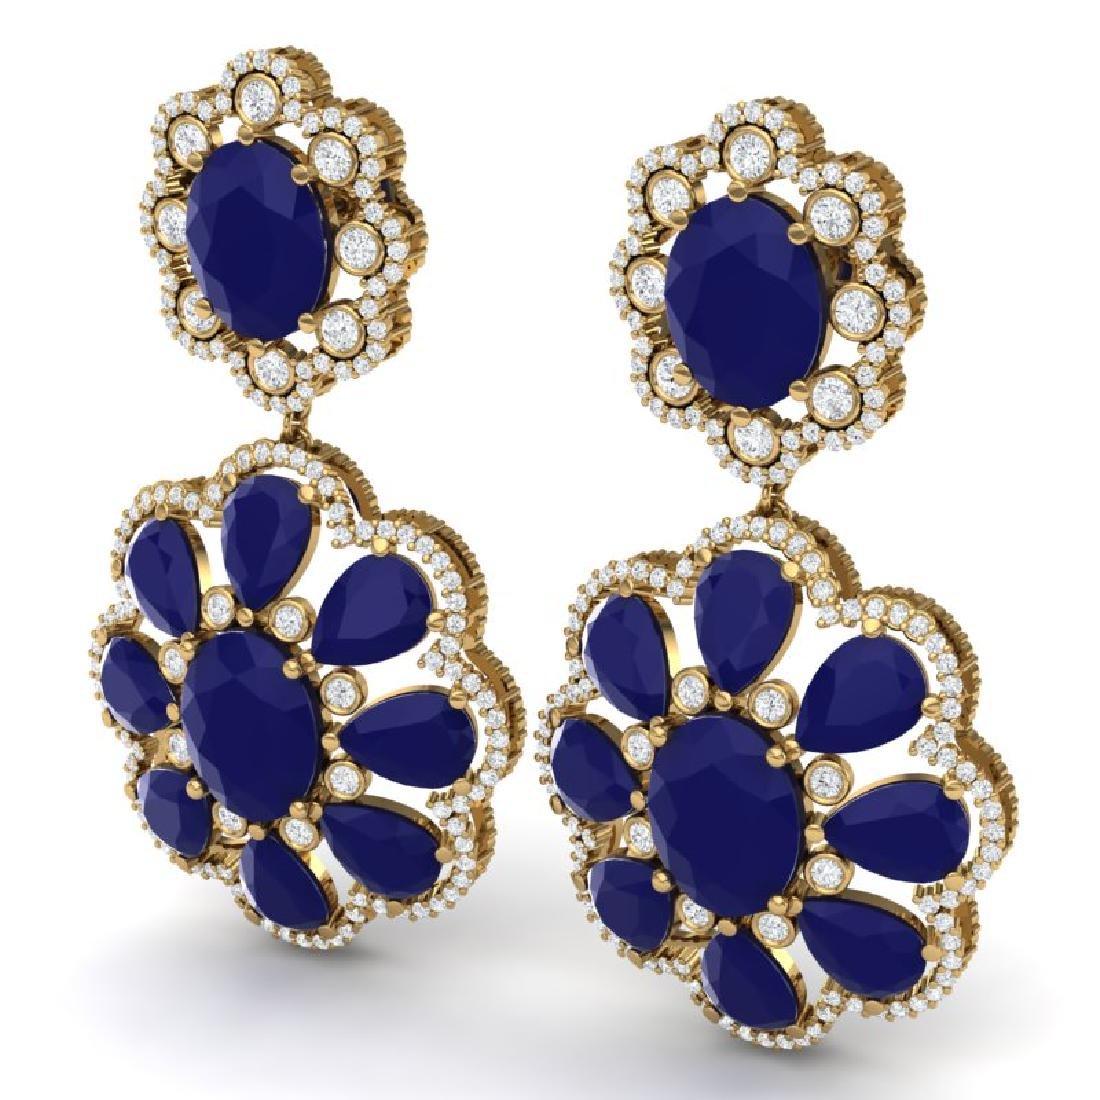 33.88 CTW Royalty Sapphire & VS Diamond Earrings 18K - 2